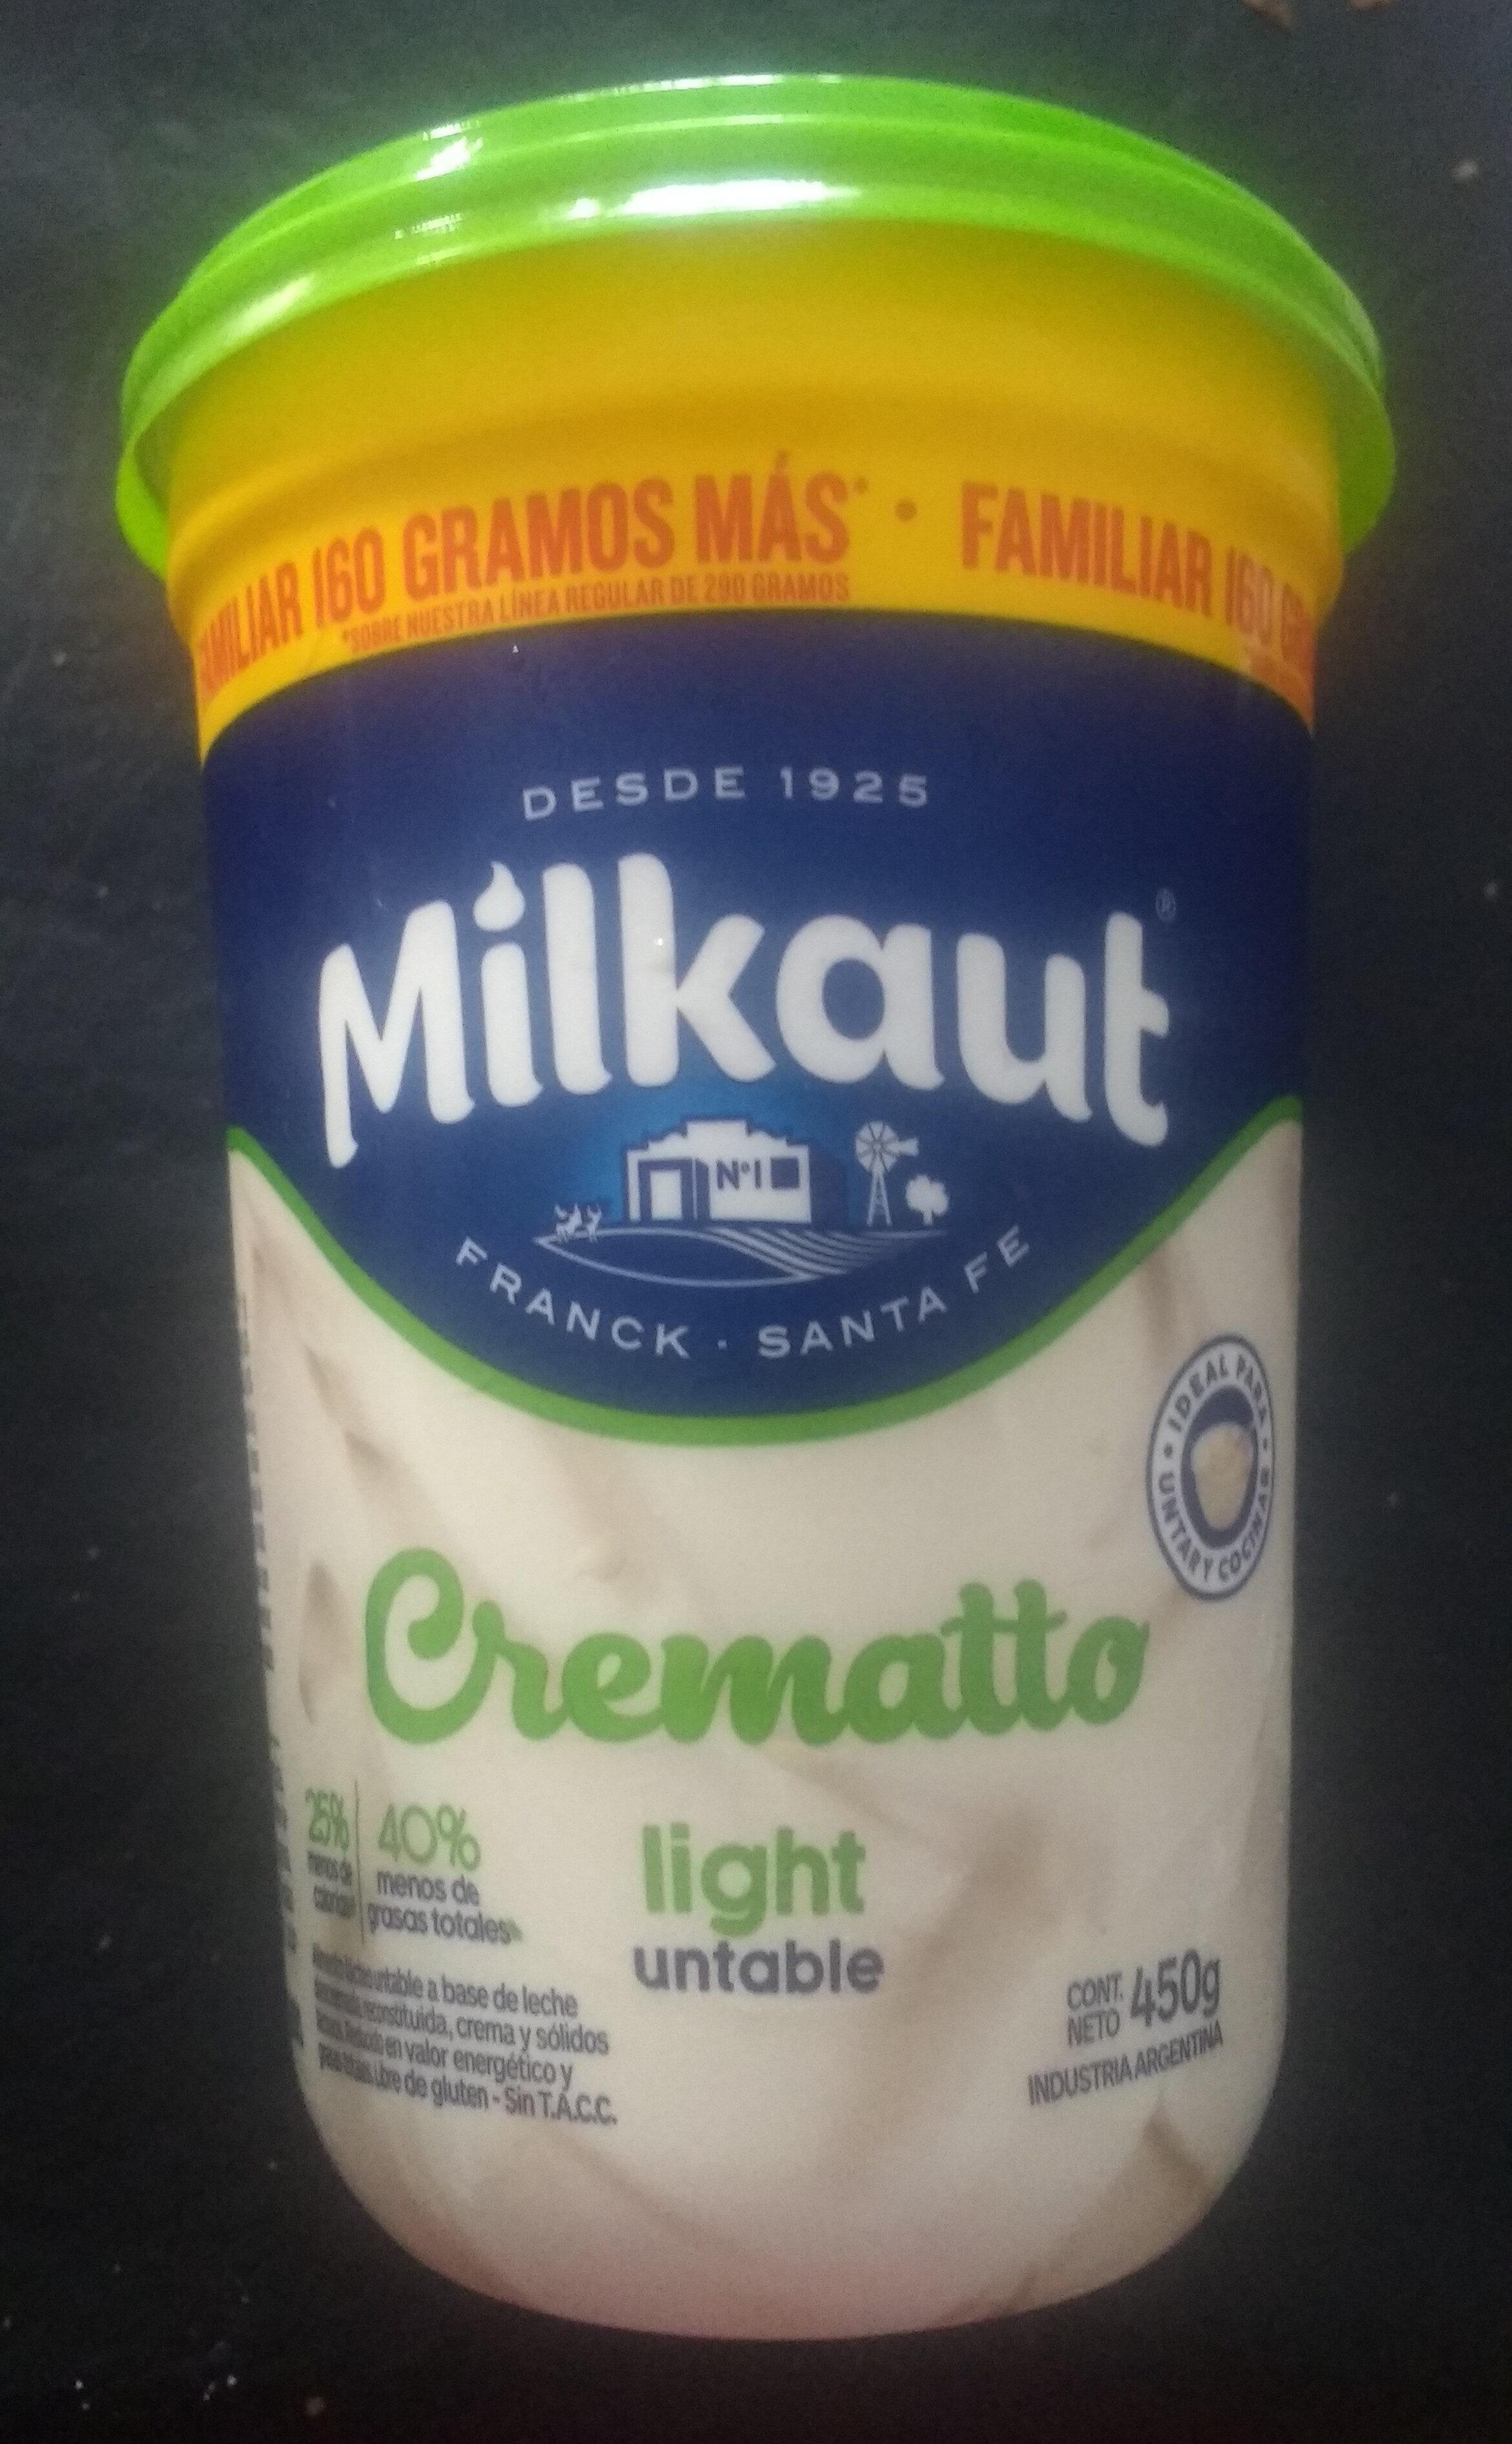 Crematto light untable - Produit - es